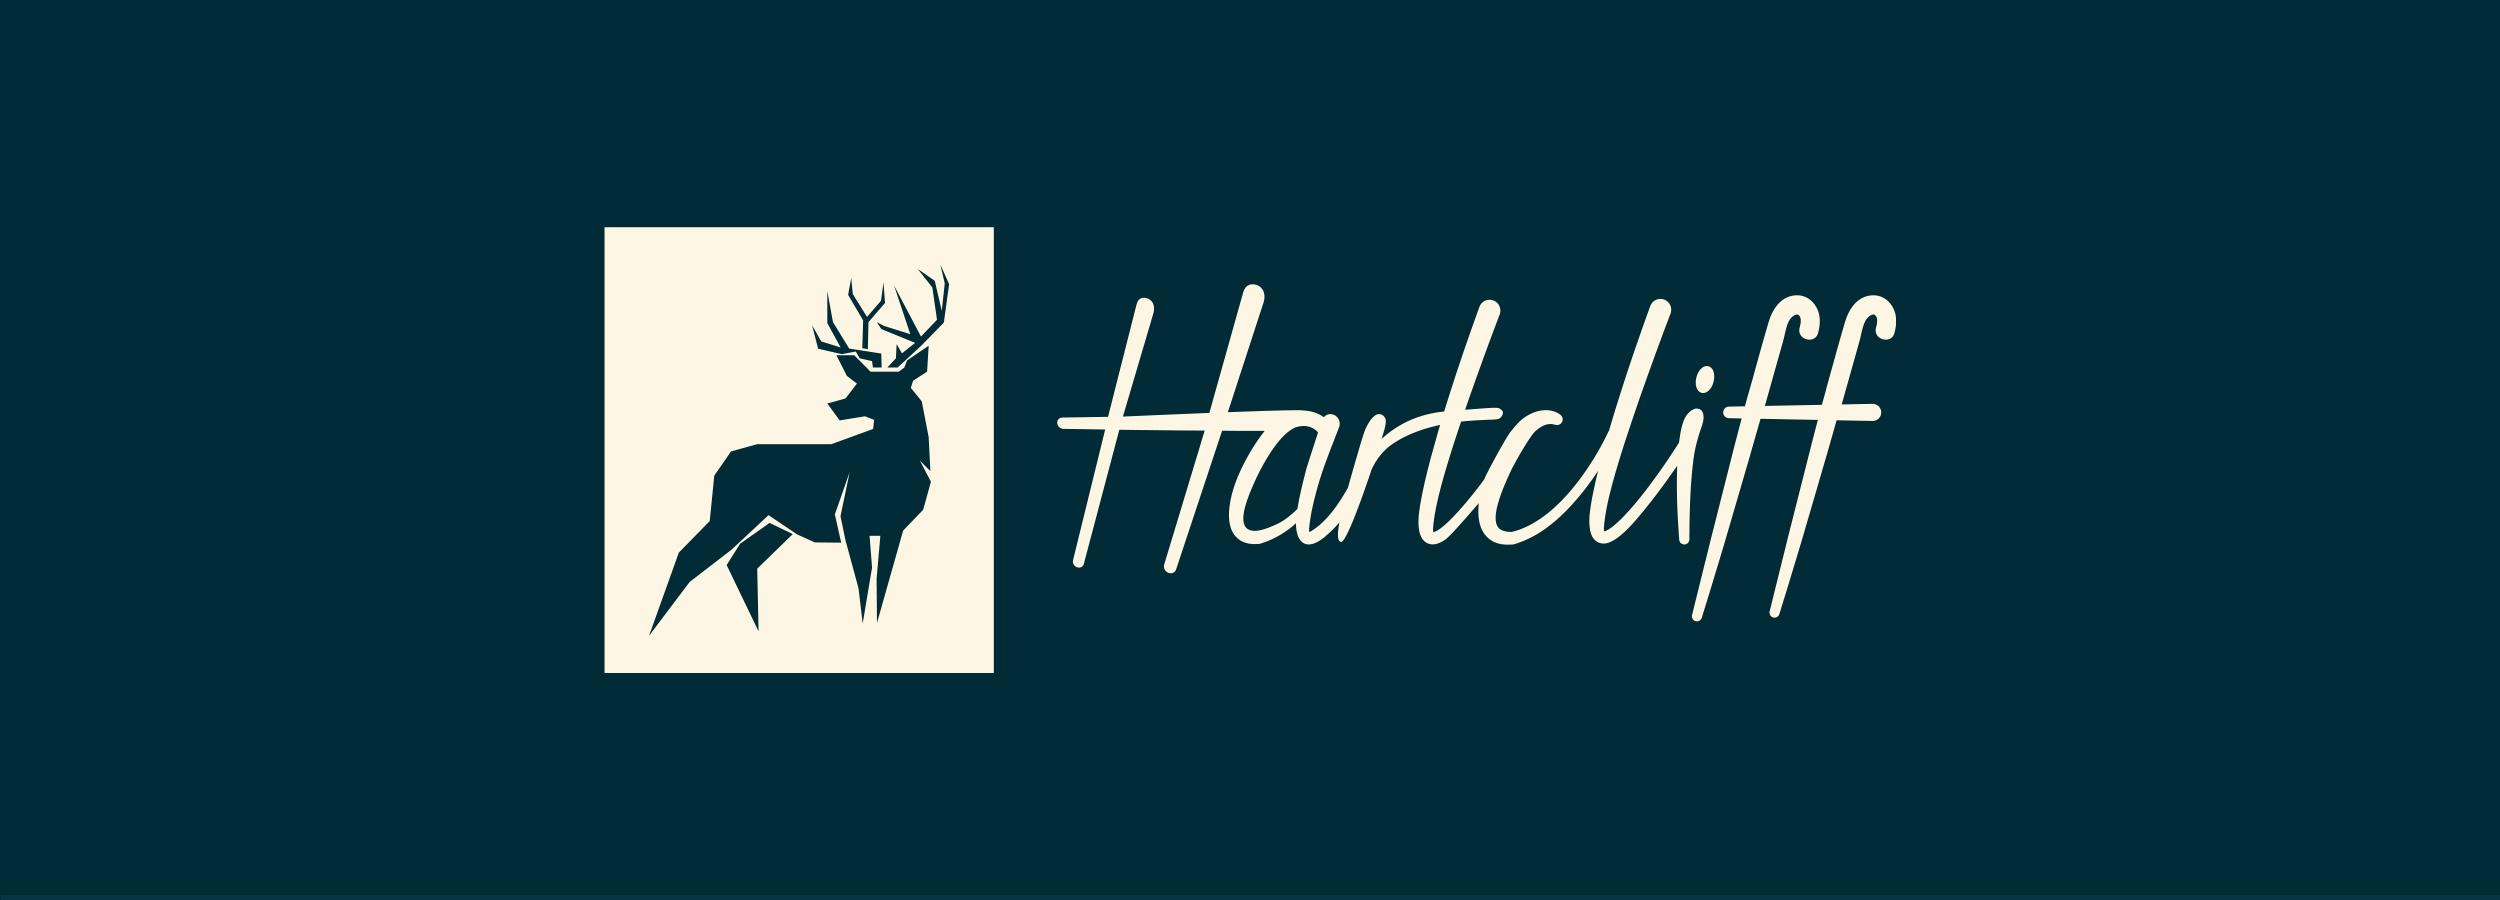 Full Hartcliff logo